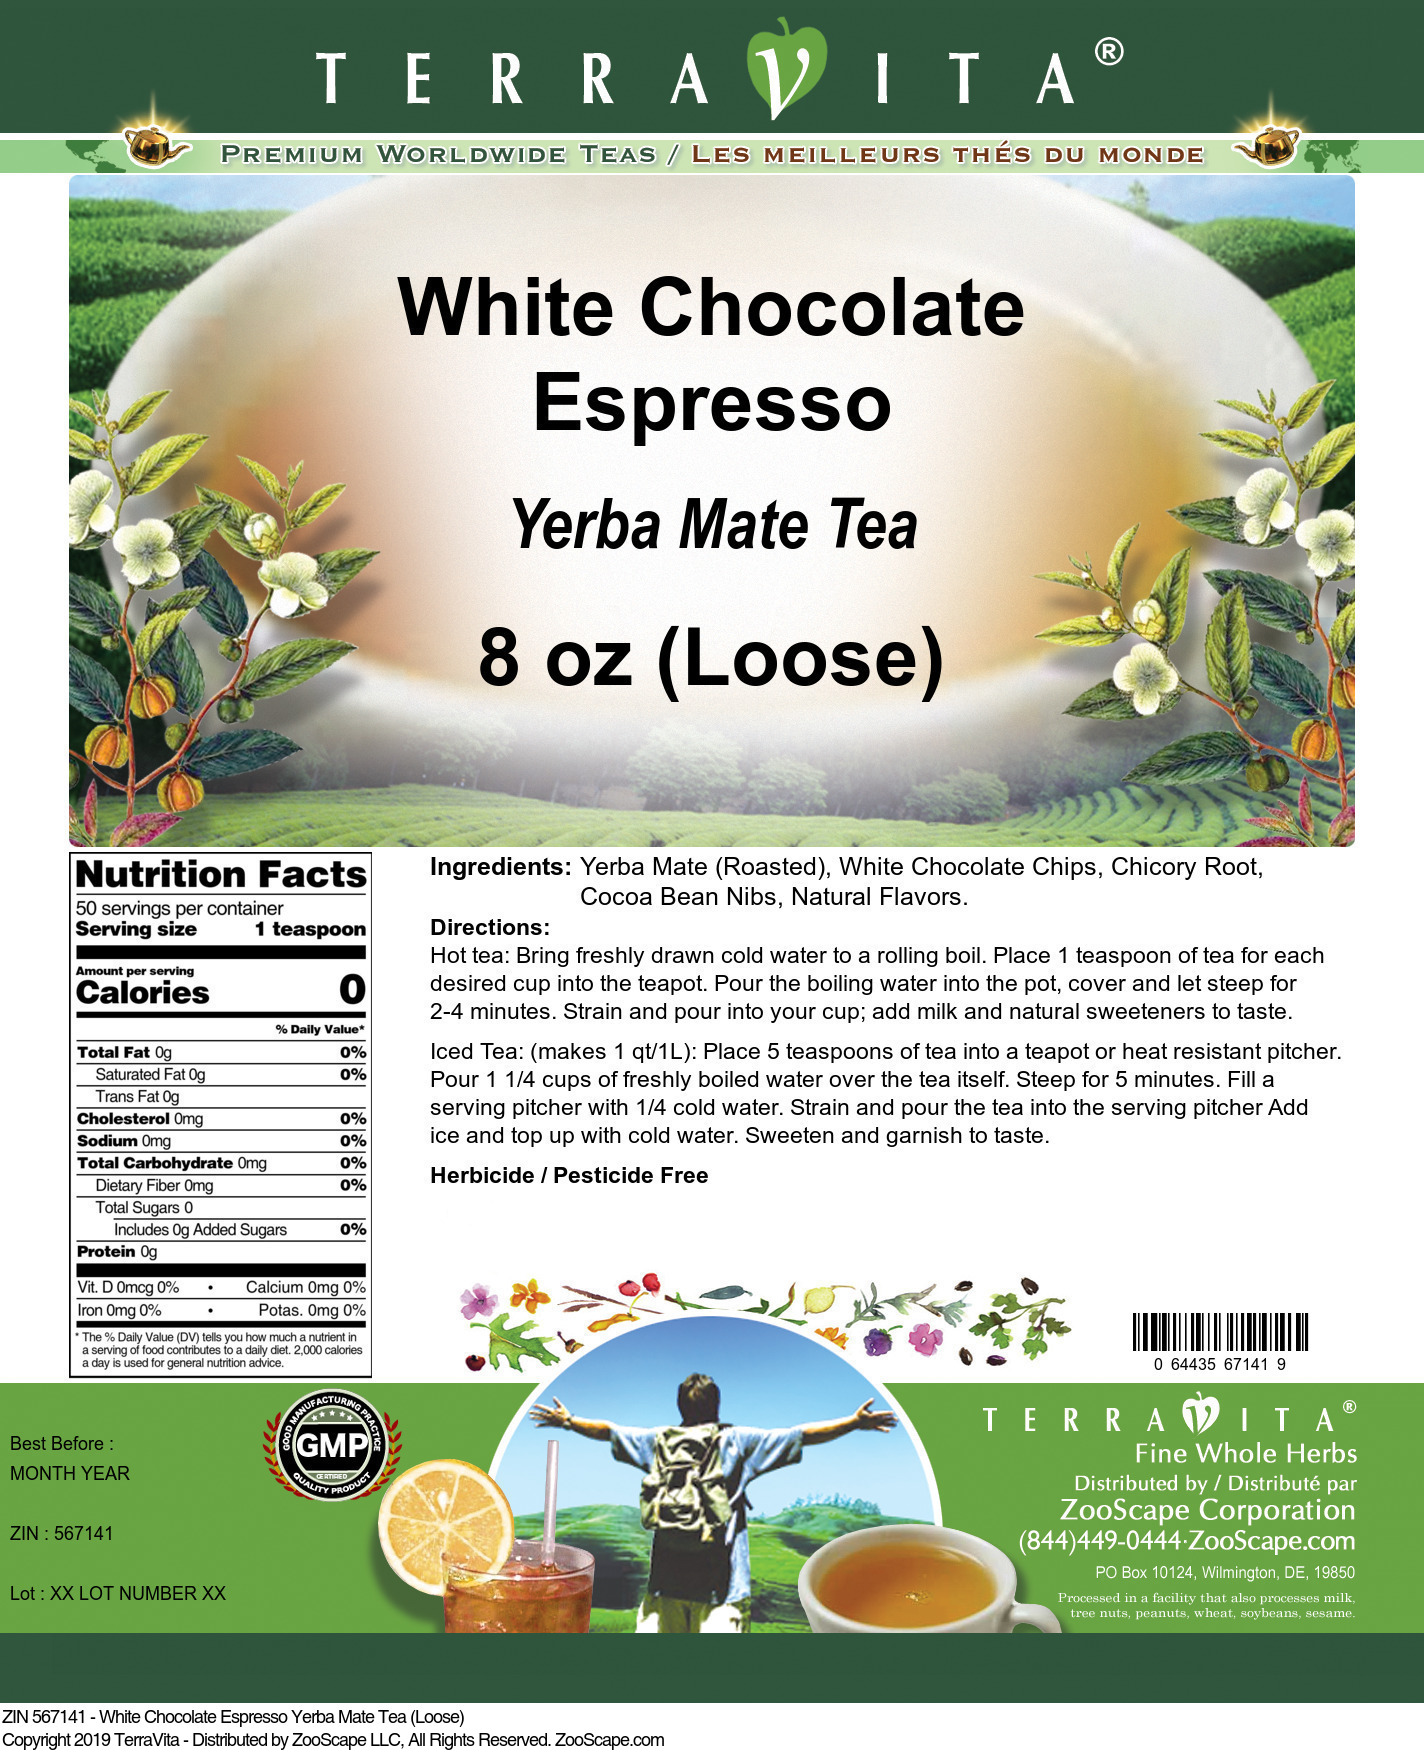 White Chocolate Espresso Yerba Mate